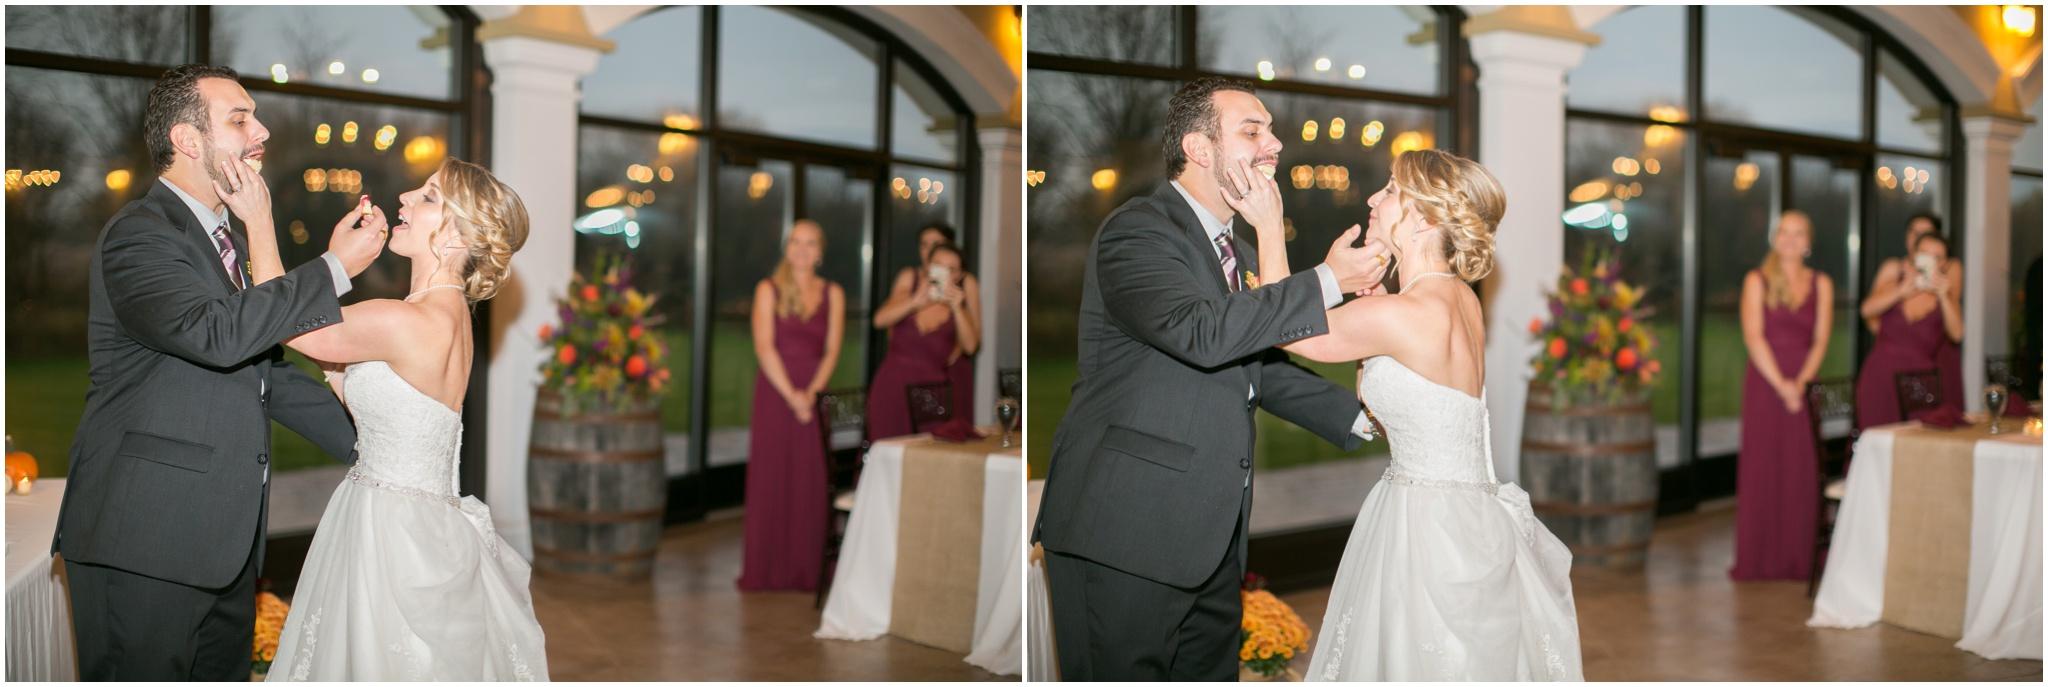 DC_Estate_Winery_Wedding_Beloit_Illinois_Wedding_0079.jpg